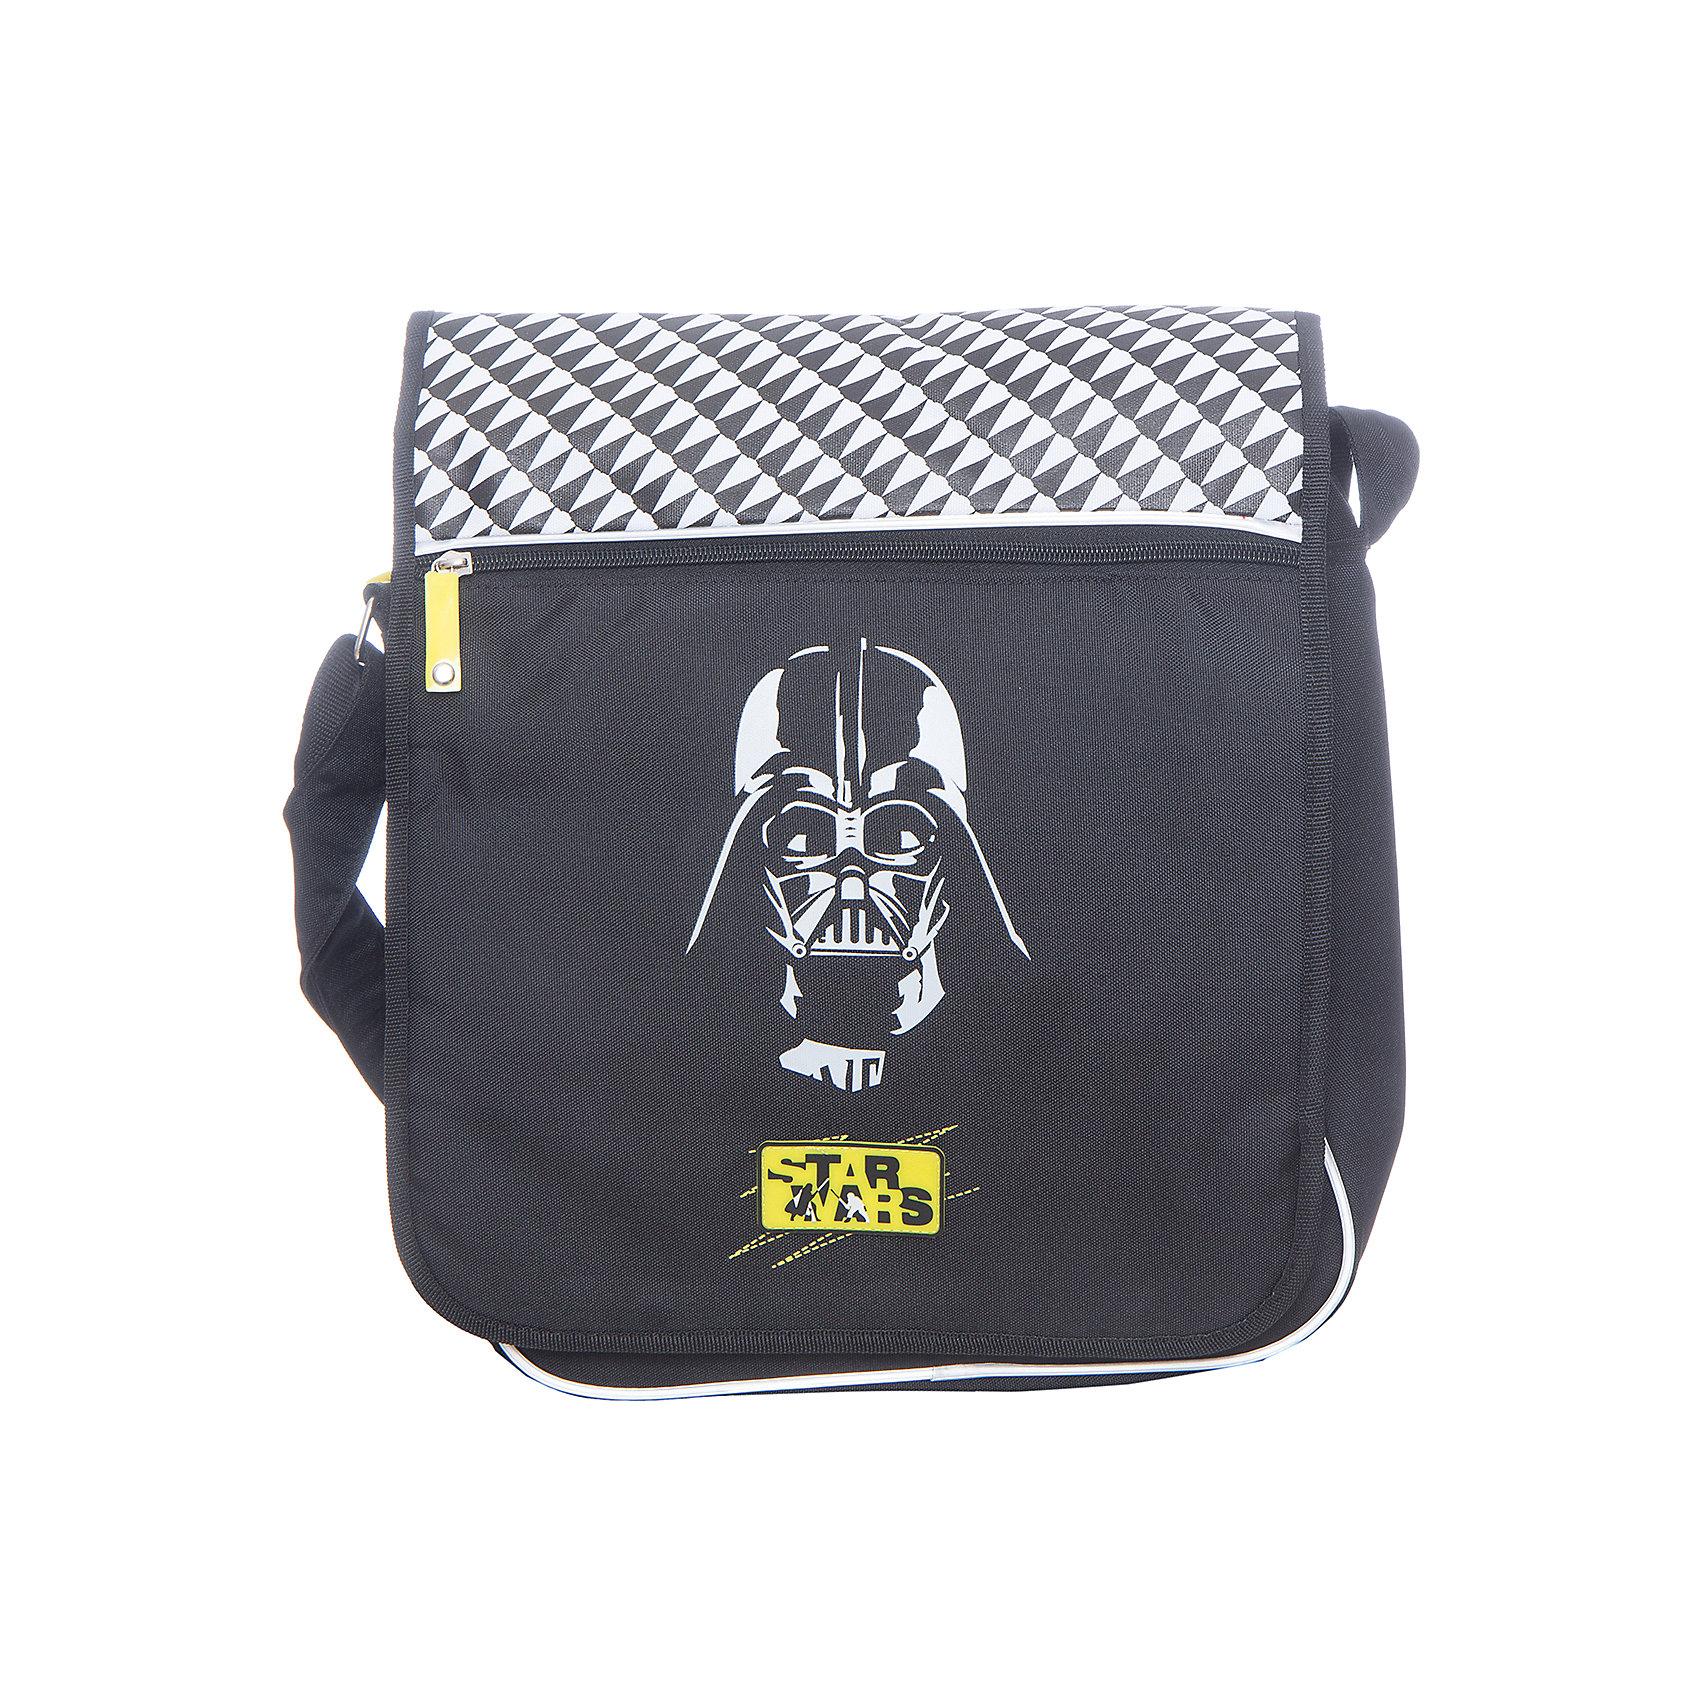 Star Wars Сумка школьная Darth VaderШкольные сумки<br><br><br>Ширина мм: 450<br>Глубина мм: 350<br>Высота мм: 10<br>Вес г: 628<br>Возраст от месяцев: 84<br>Возраст до месяцев: 108<br>Пол: Мужской<br>Возраст: Детский<br>SKU: 6878895